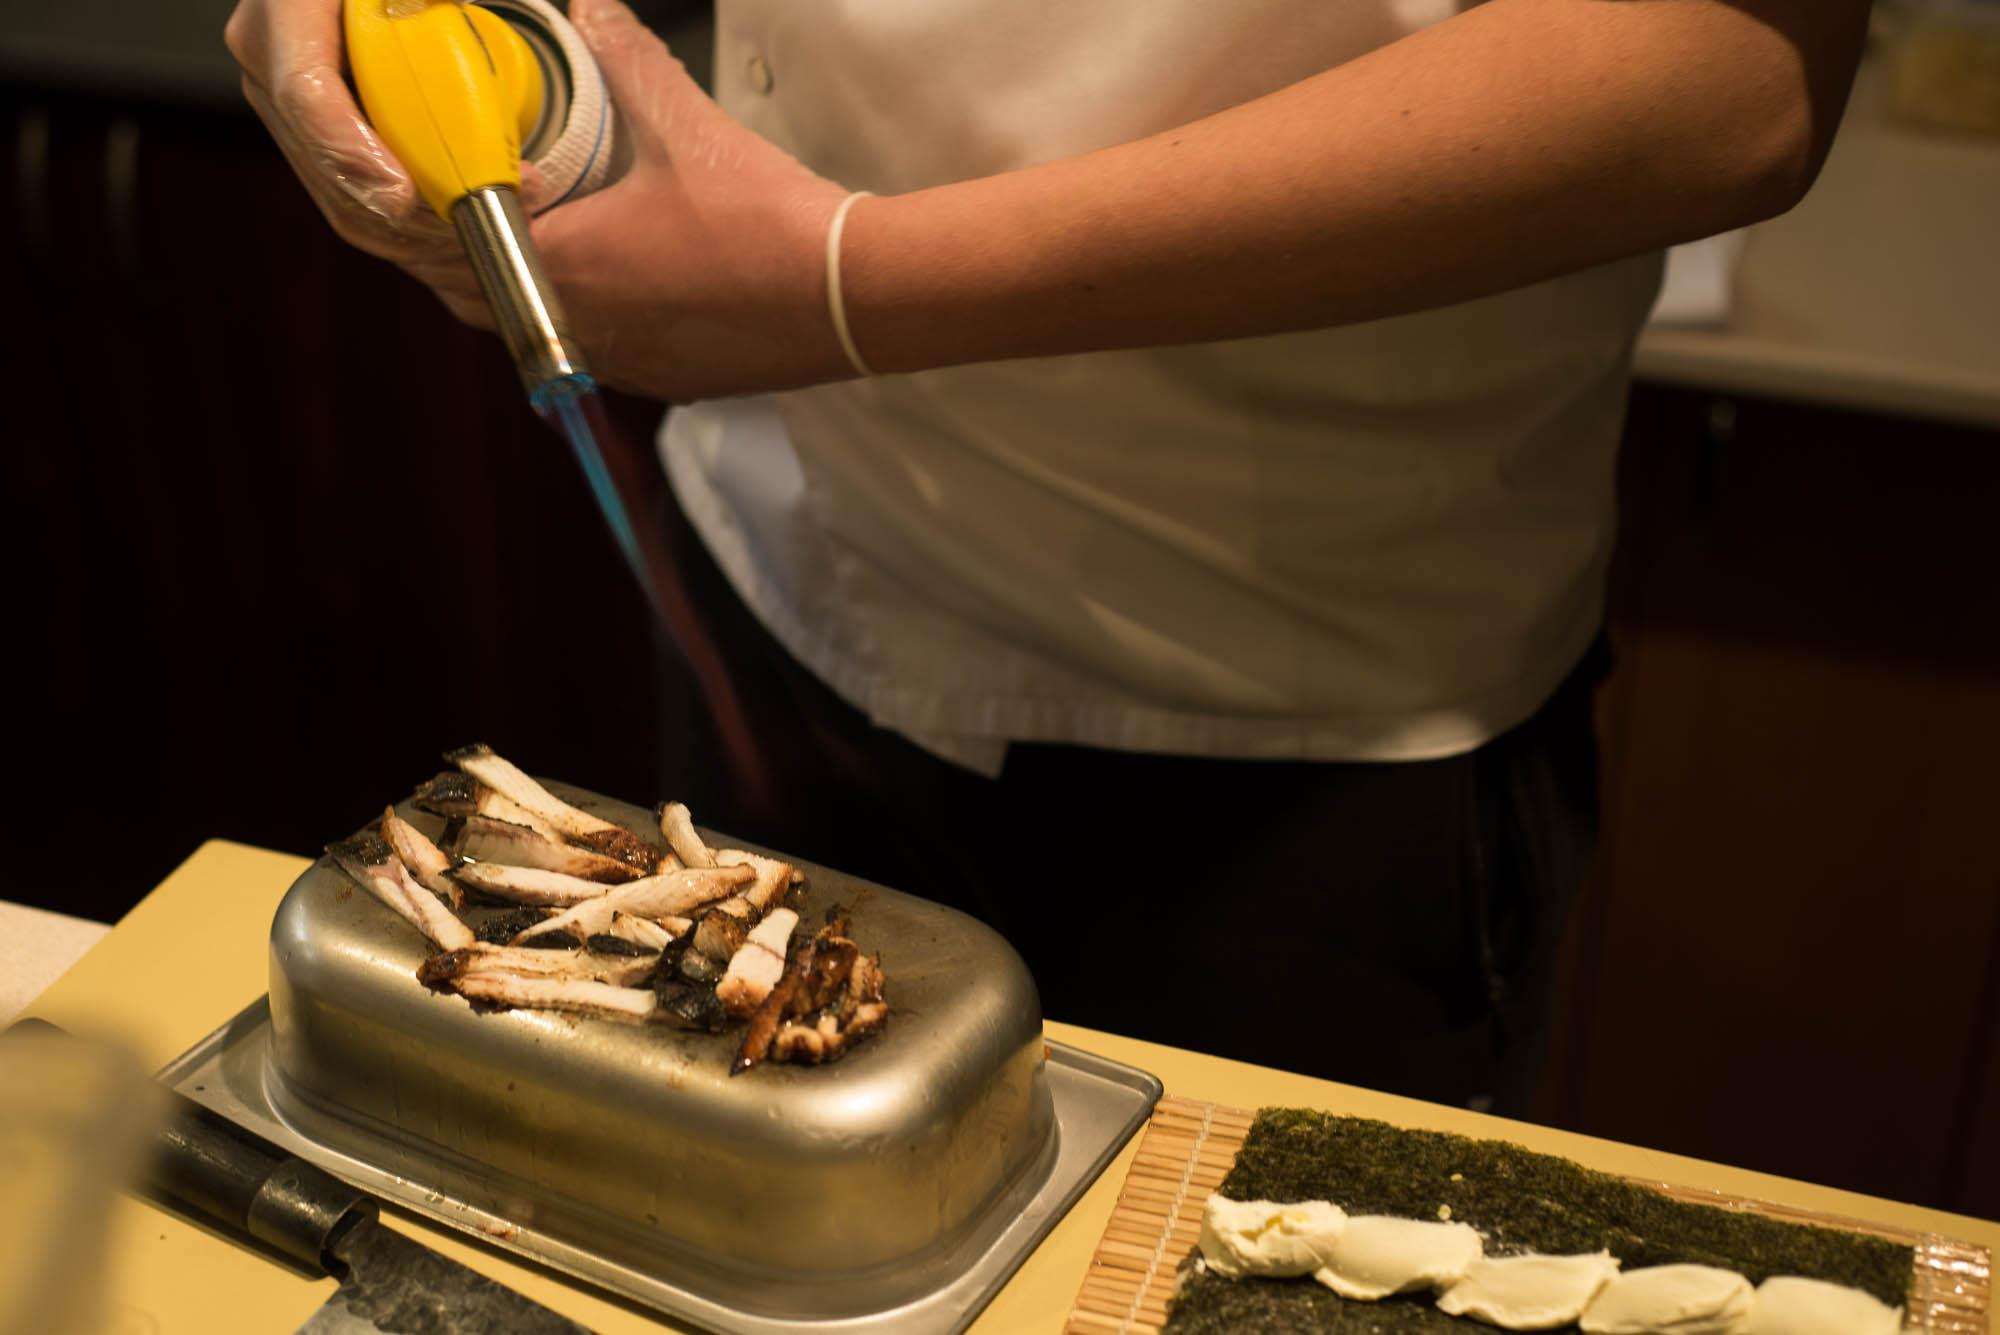 Порция роллов в ресторане «Авторская студия суши» стоит 250 гривен